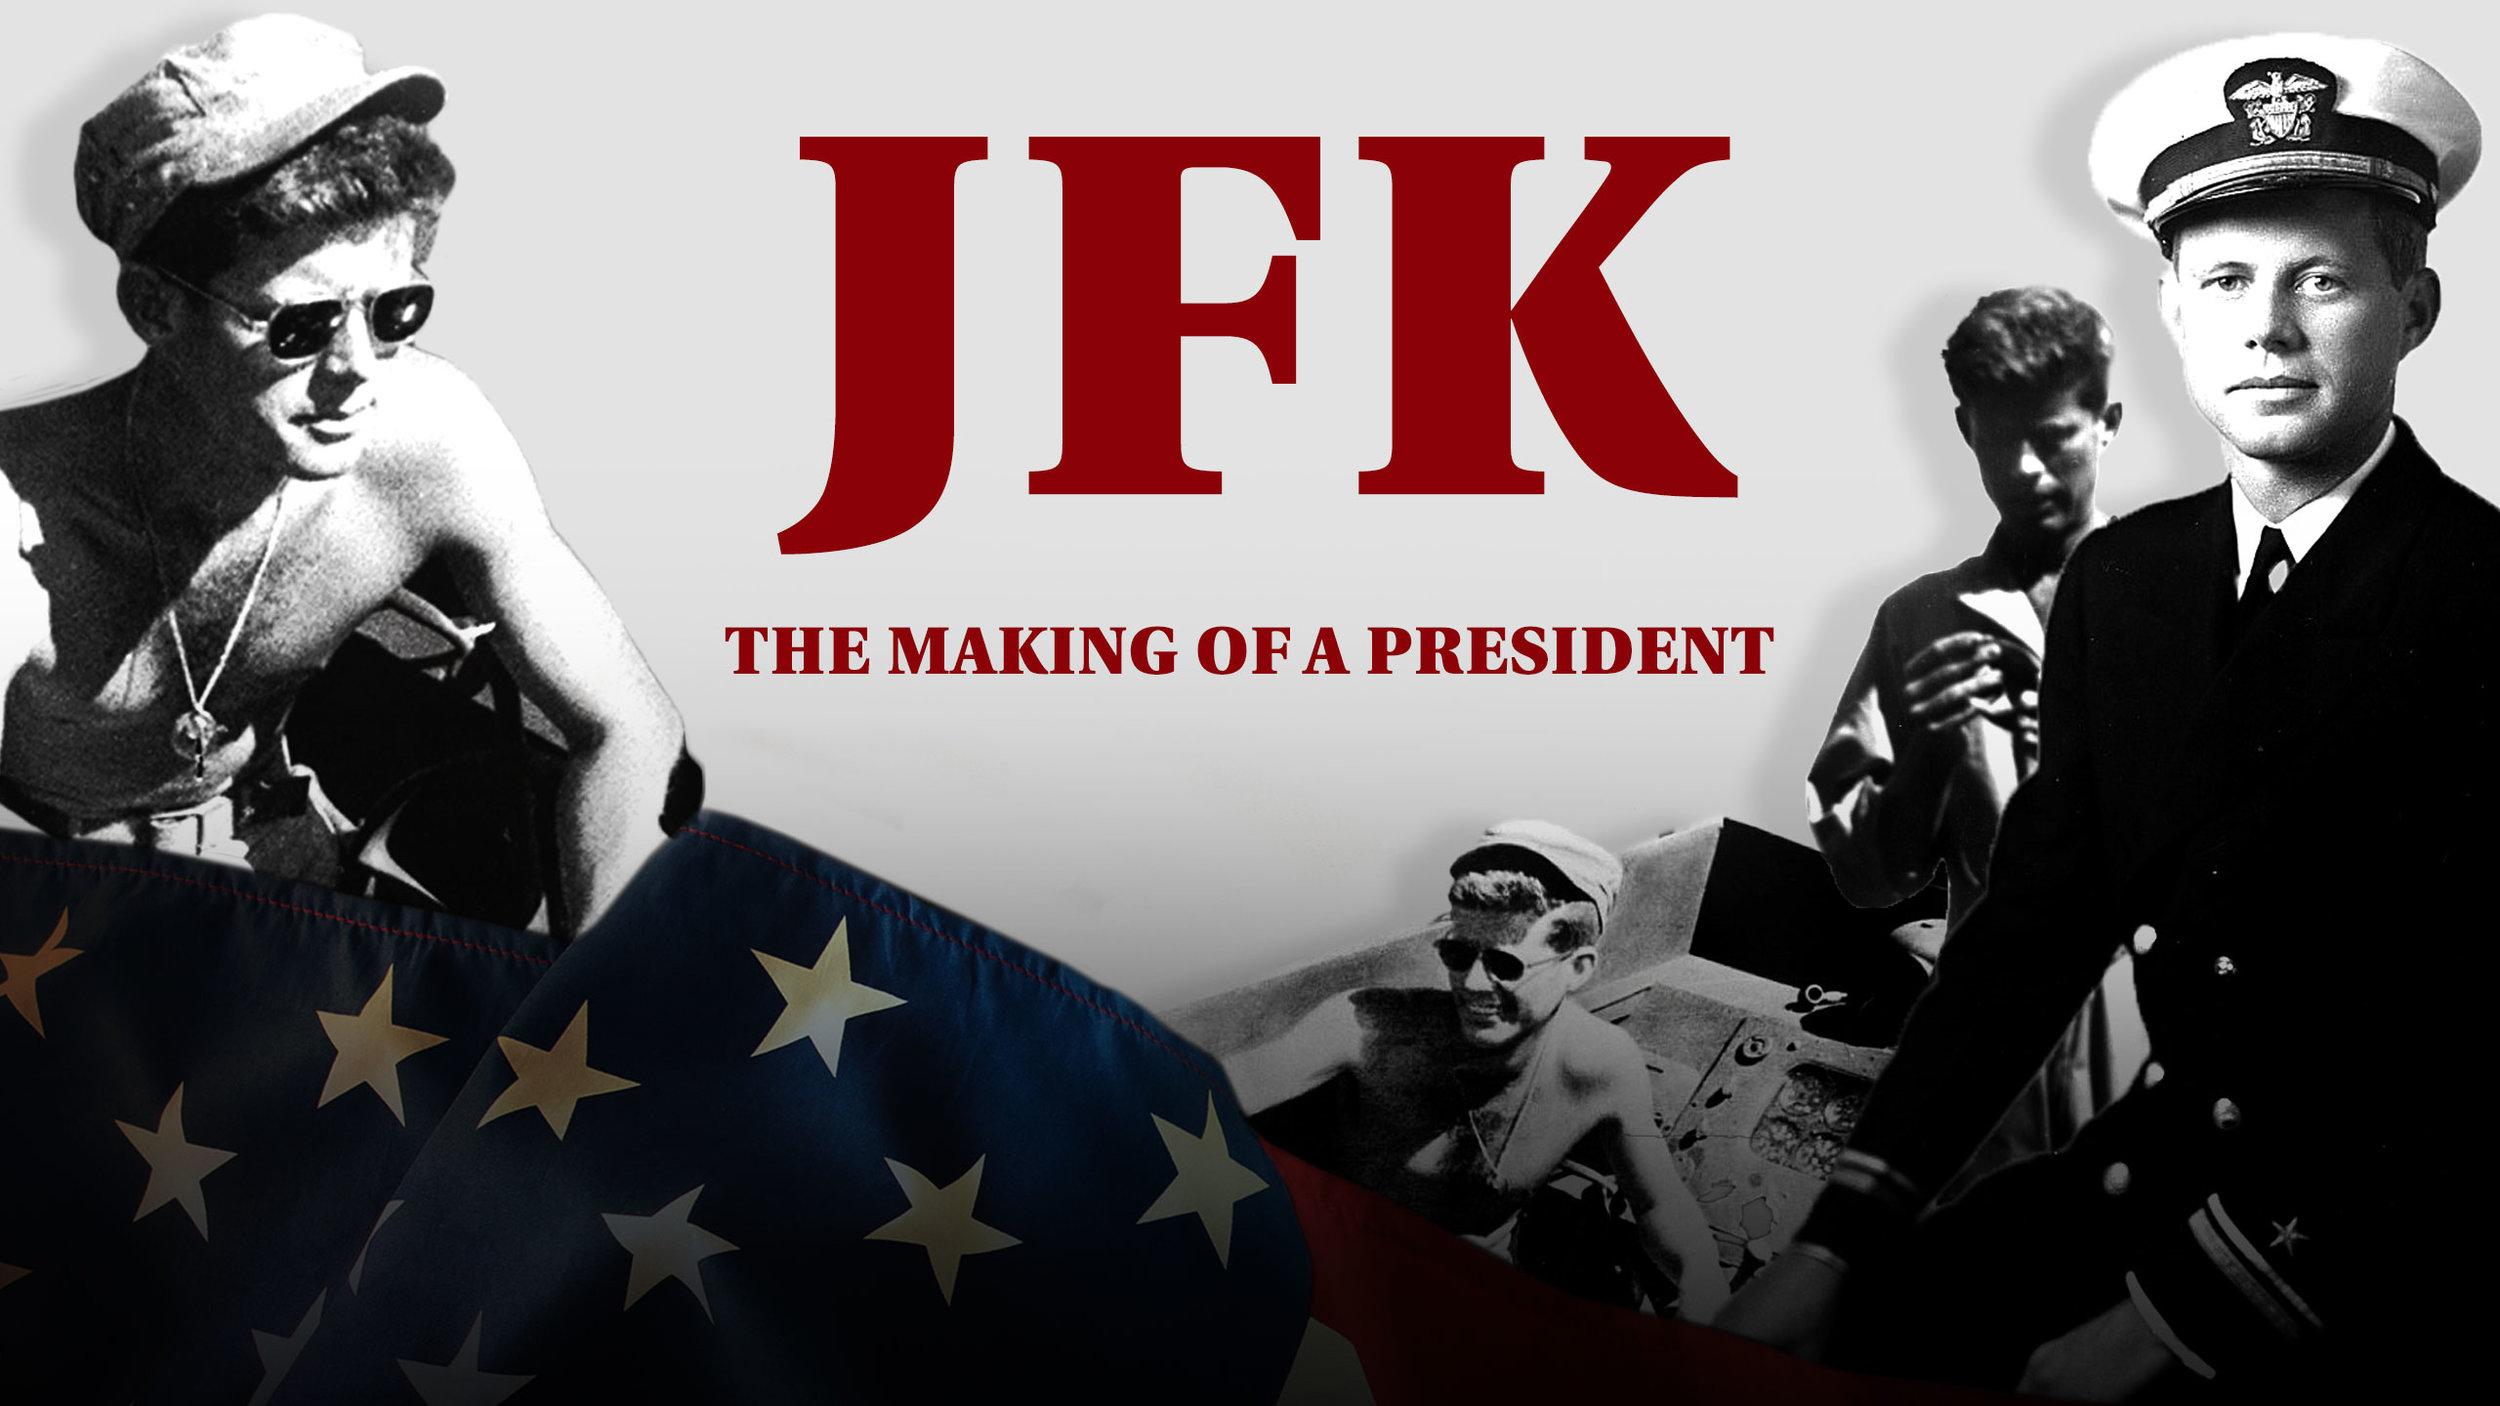 [Netflix-JFK-THE-MAKING-OF-A-PRESIDENT]_[EN_US]_2560x1440.jpg